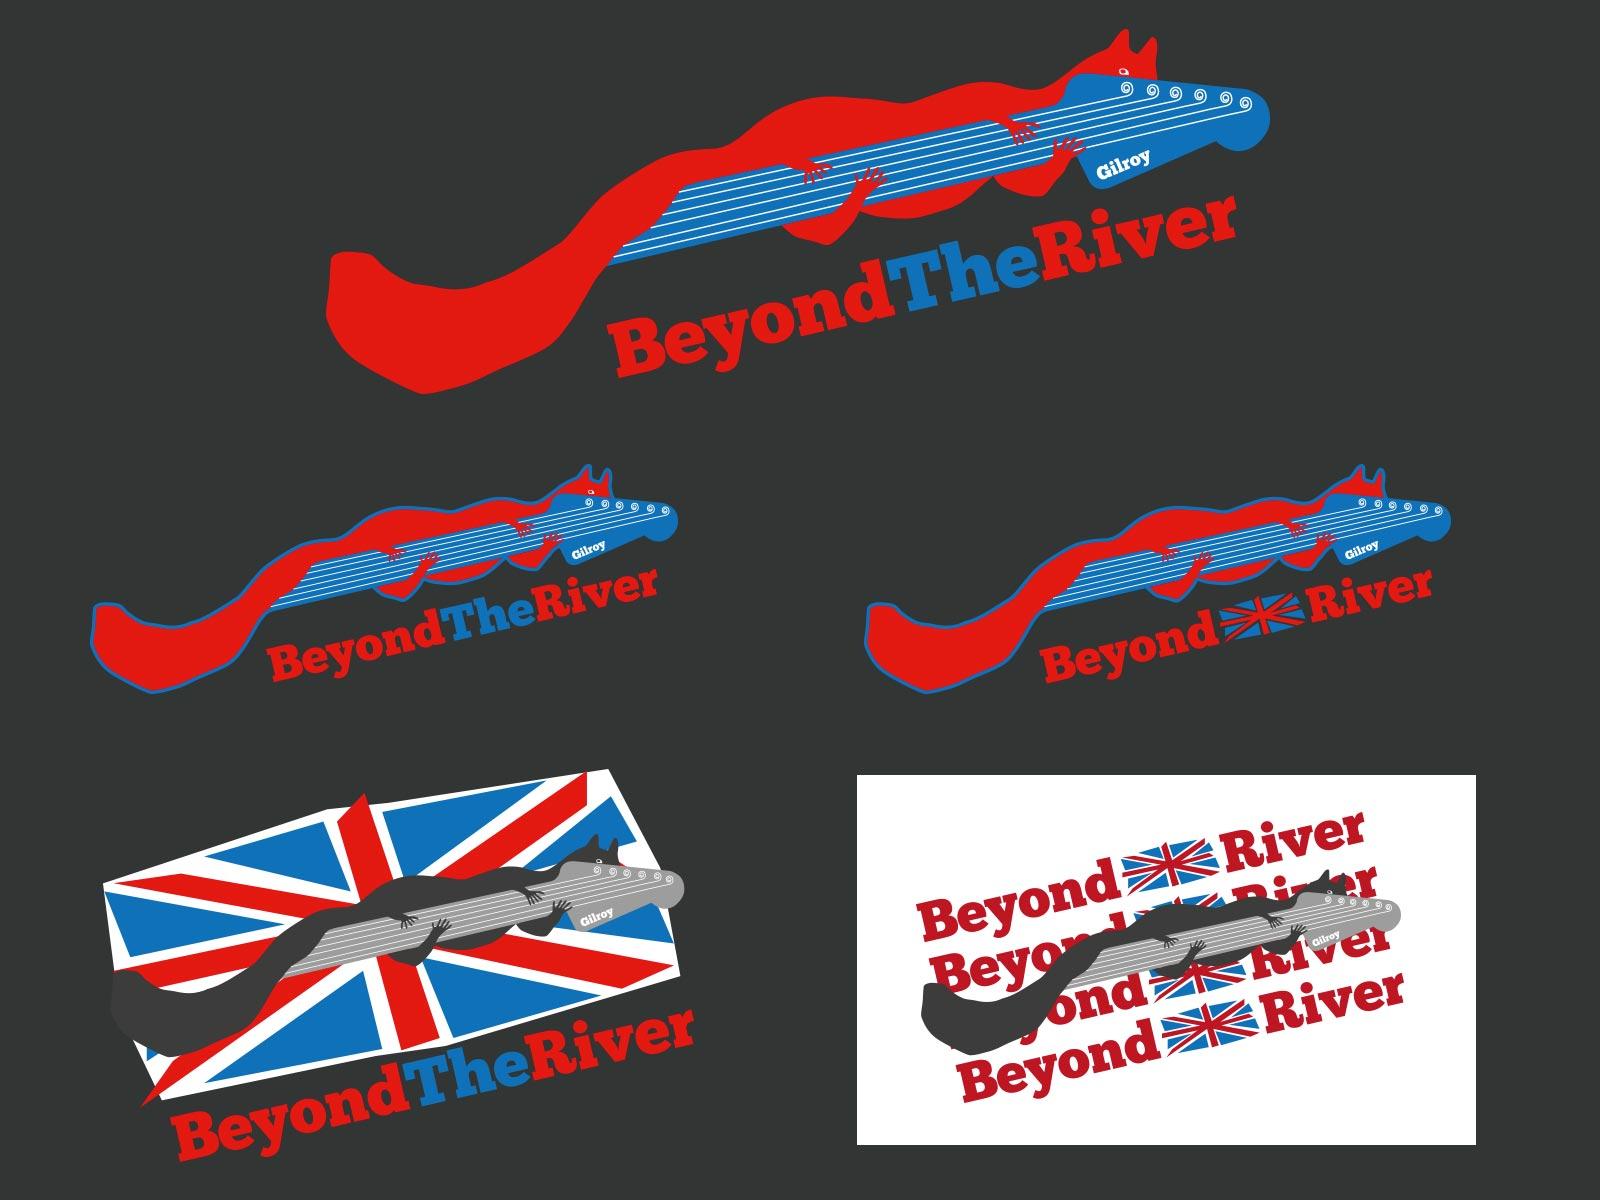 pic-beyondtheriver-logo